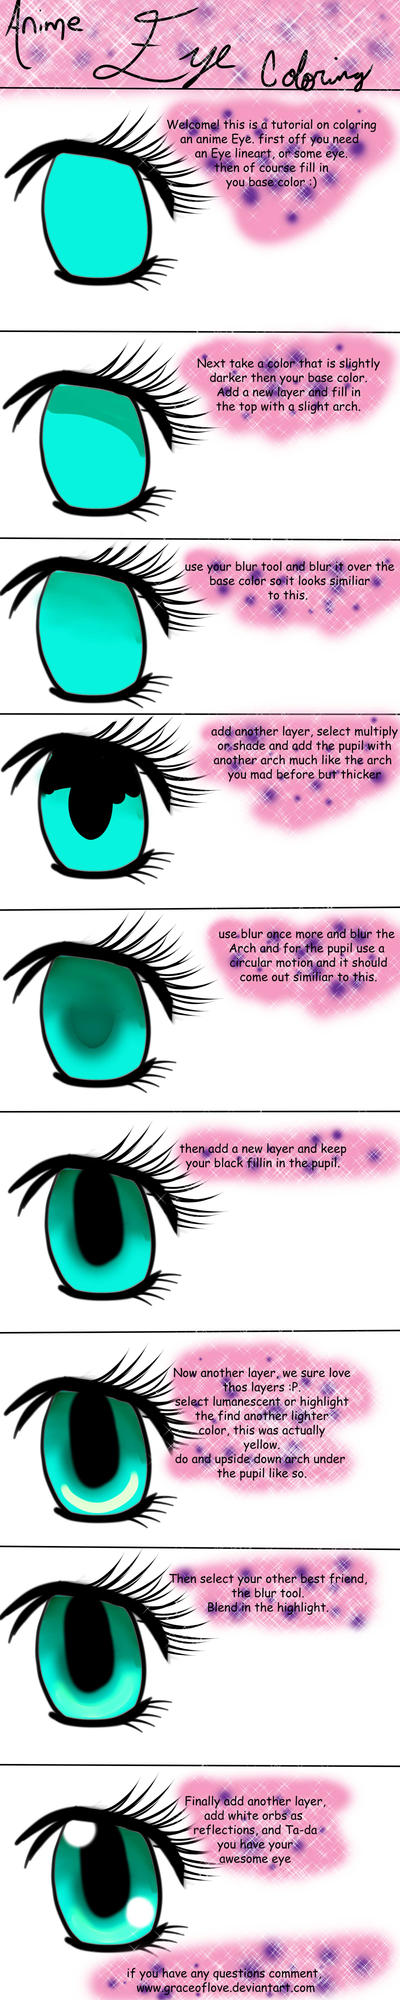 Anime eye tutorial by Graceoflove